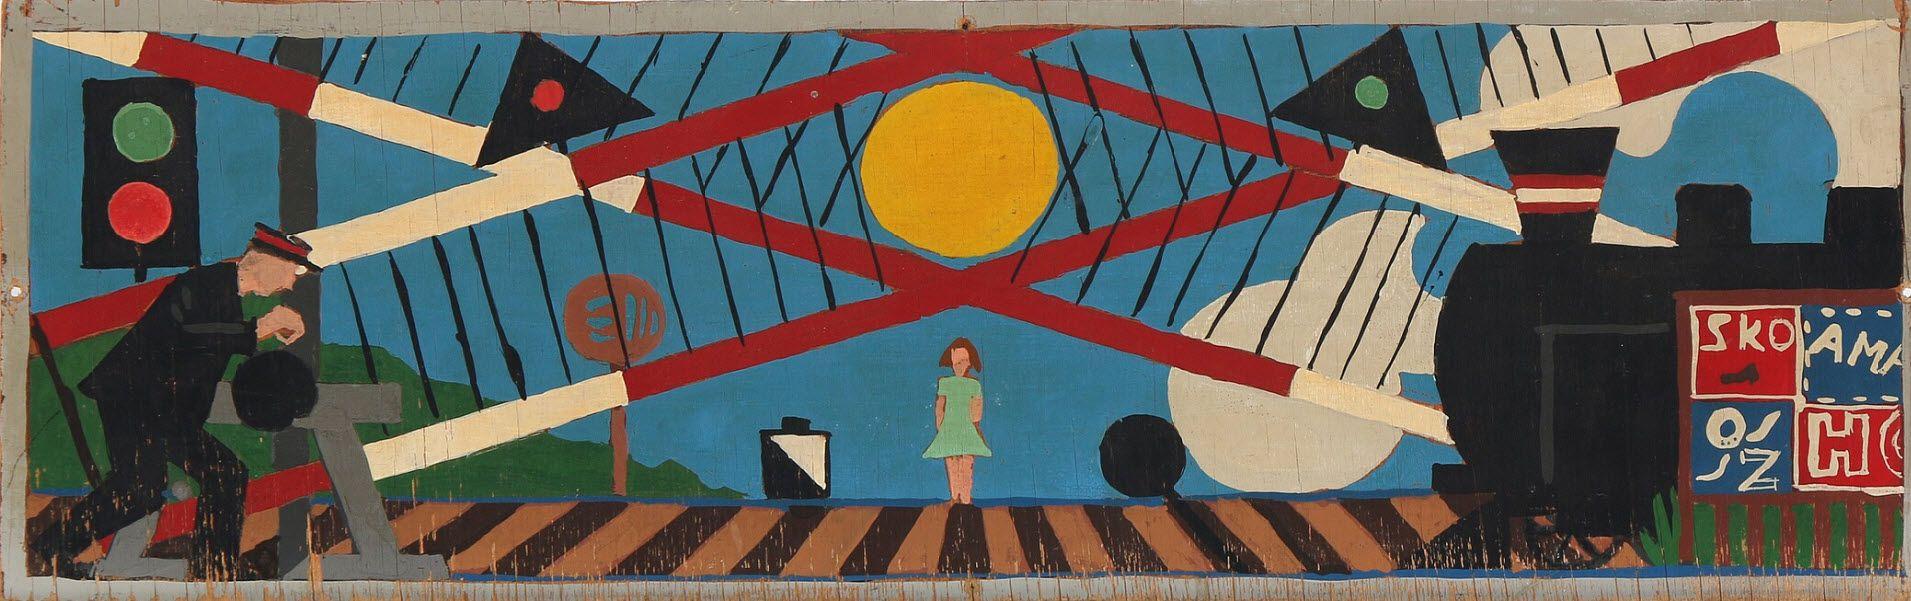 Sold Albert Mertz Flojtemand And Jernbanebomme Sketch For Decoration At Osterbro Station 1952 Unsigned Oil On Plate 14 X 44 Cm 2 Bruun Rasmussen